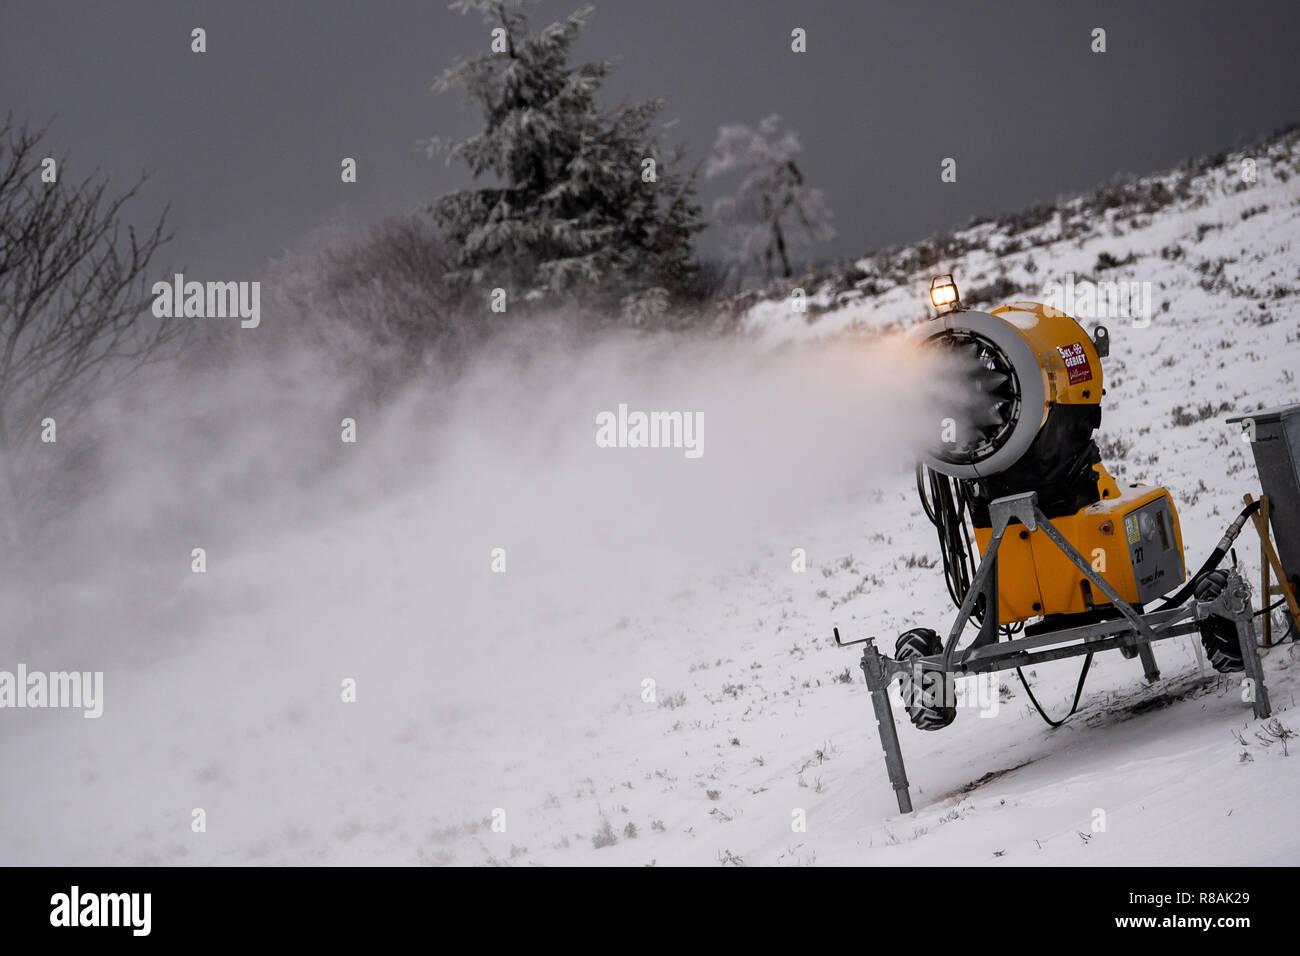 14 december 2018, hessen, willingen: a snow cannon sprays artificial